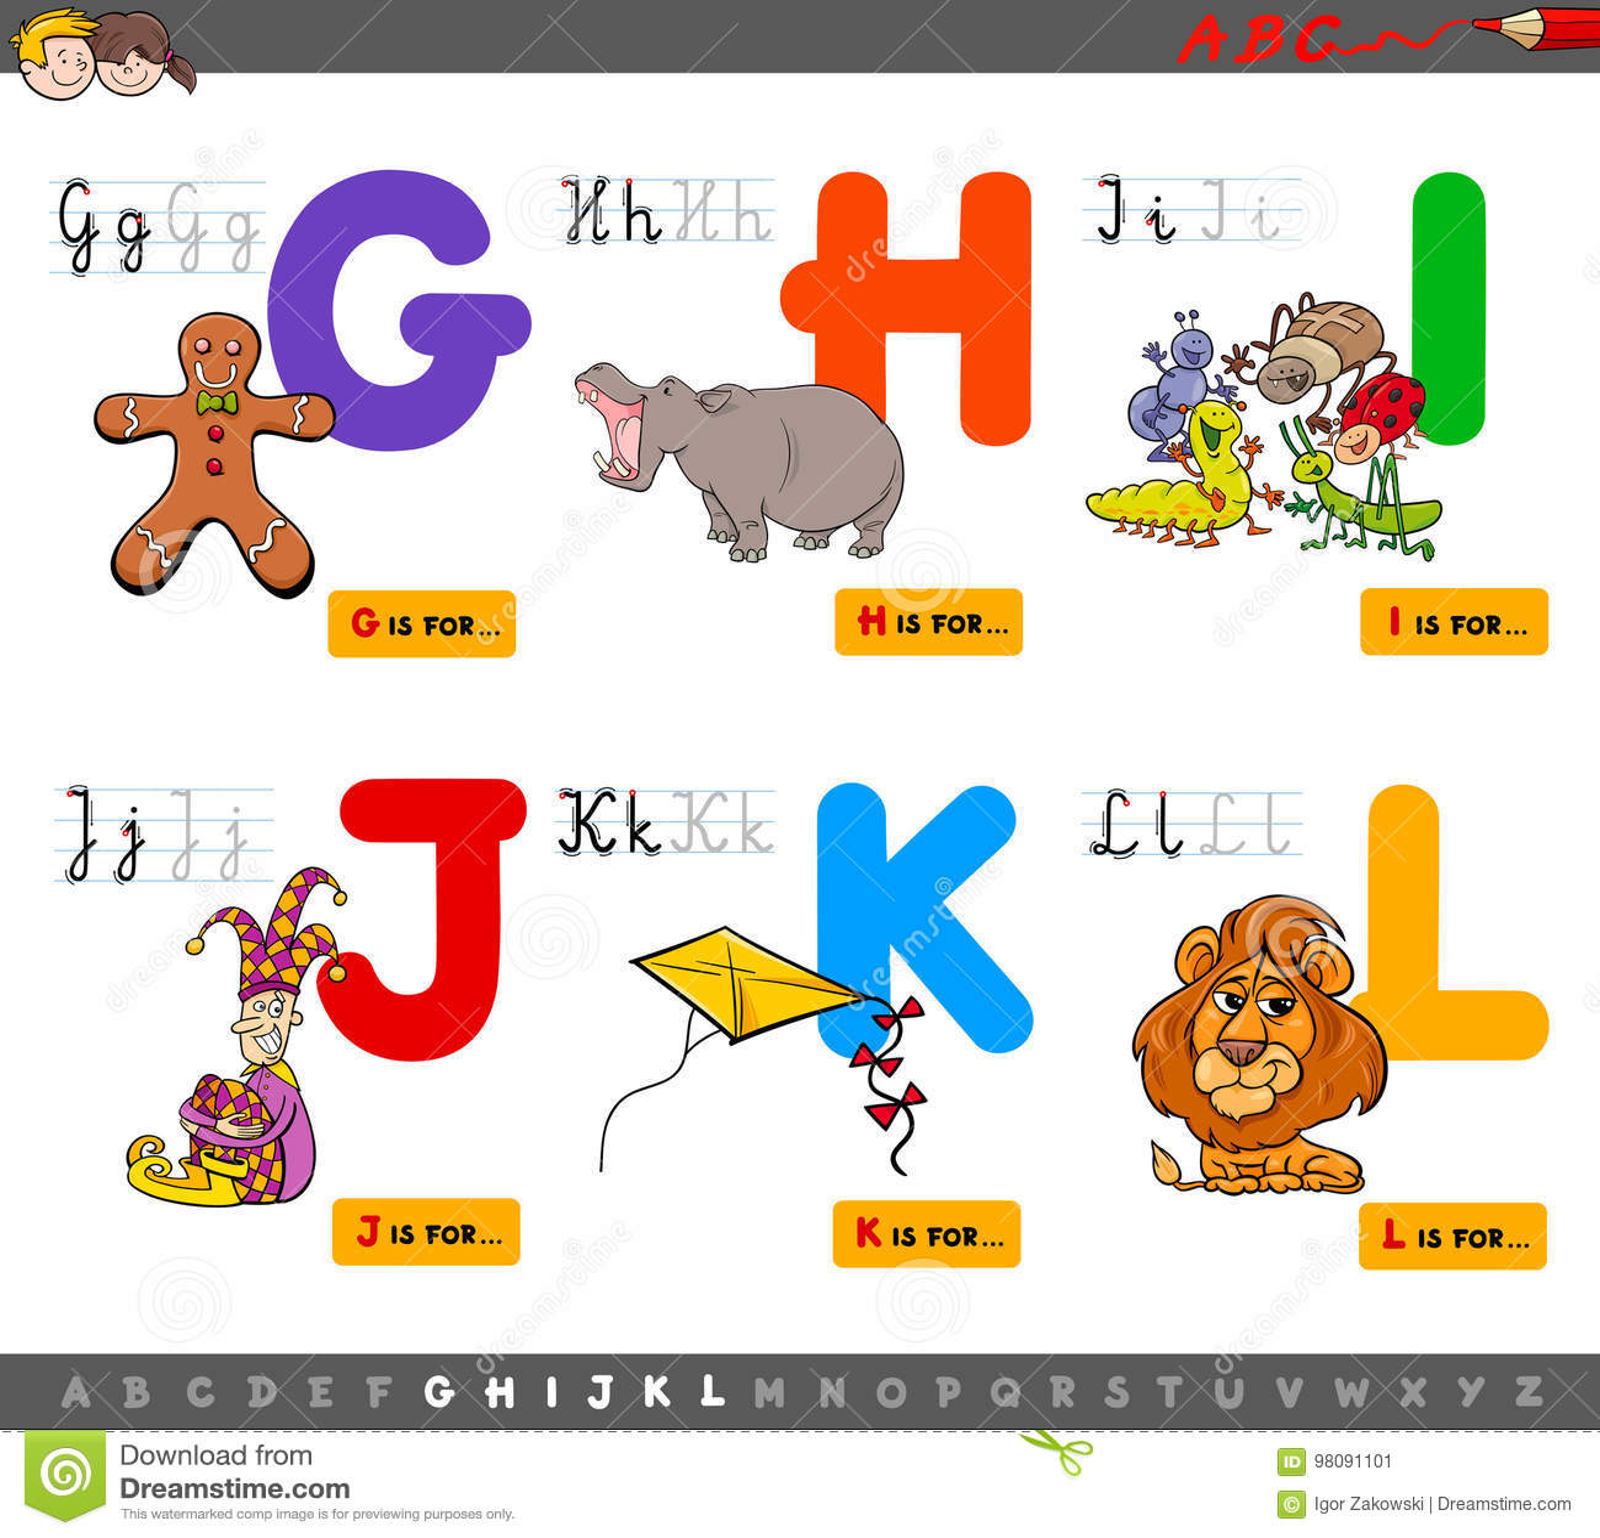 Educational Cartoon Alphabet For Kids Stock Vector Illustration of